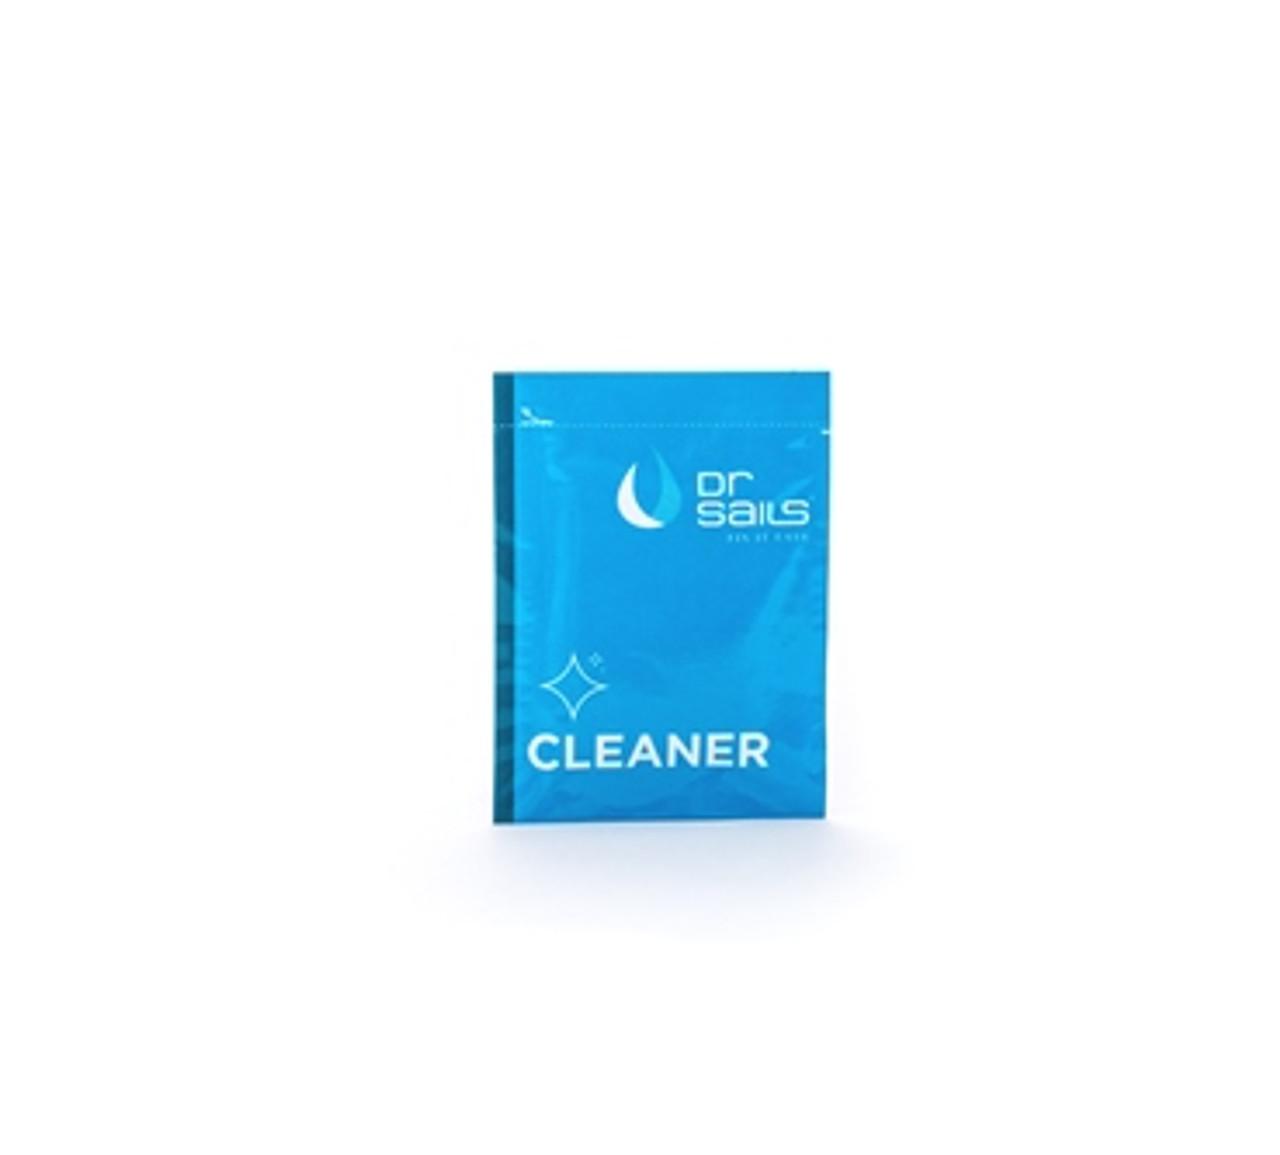 DrSails Cleaner